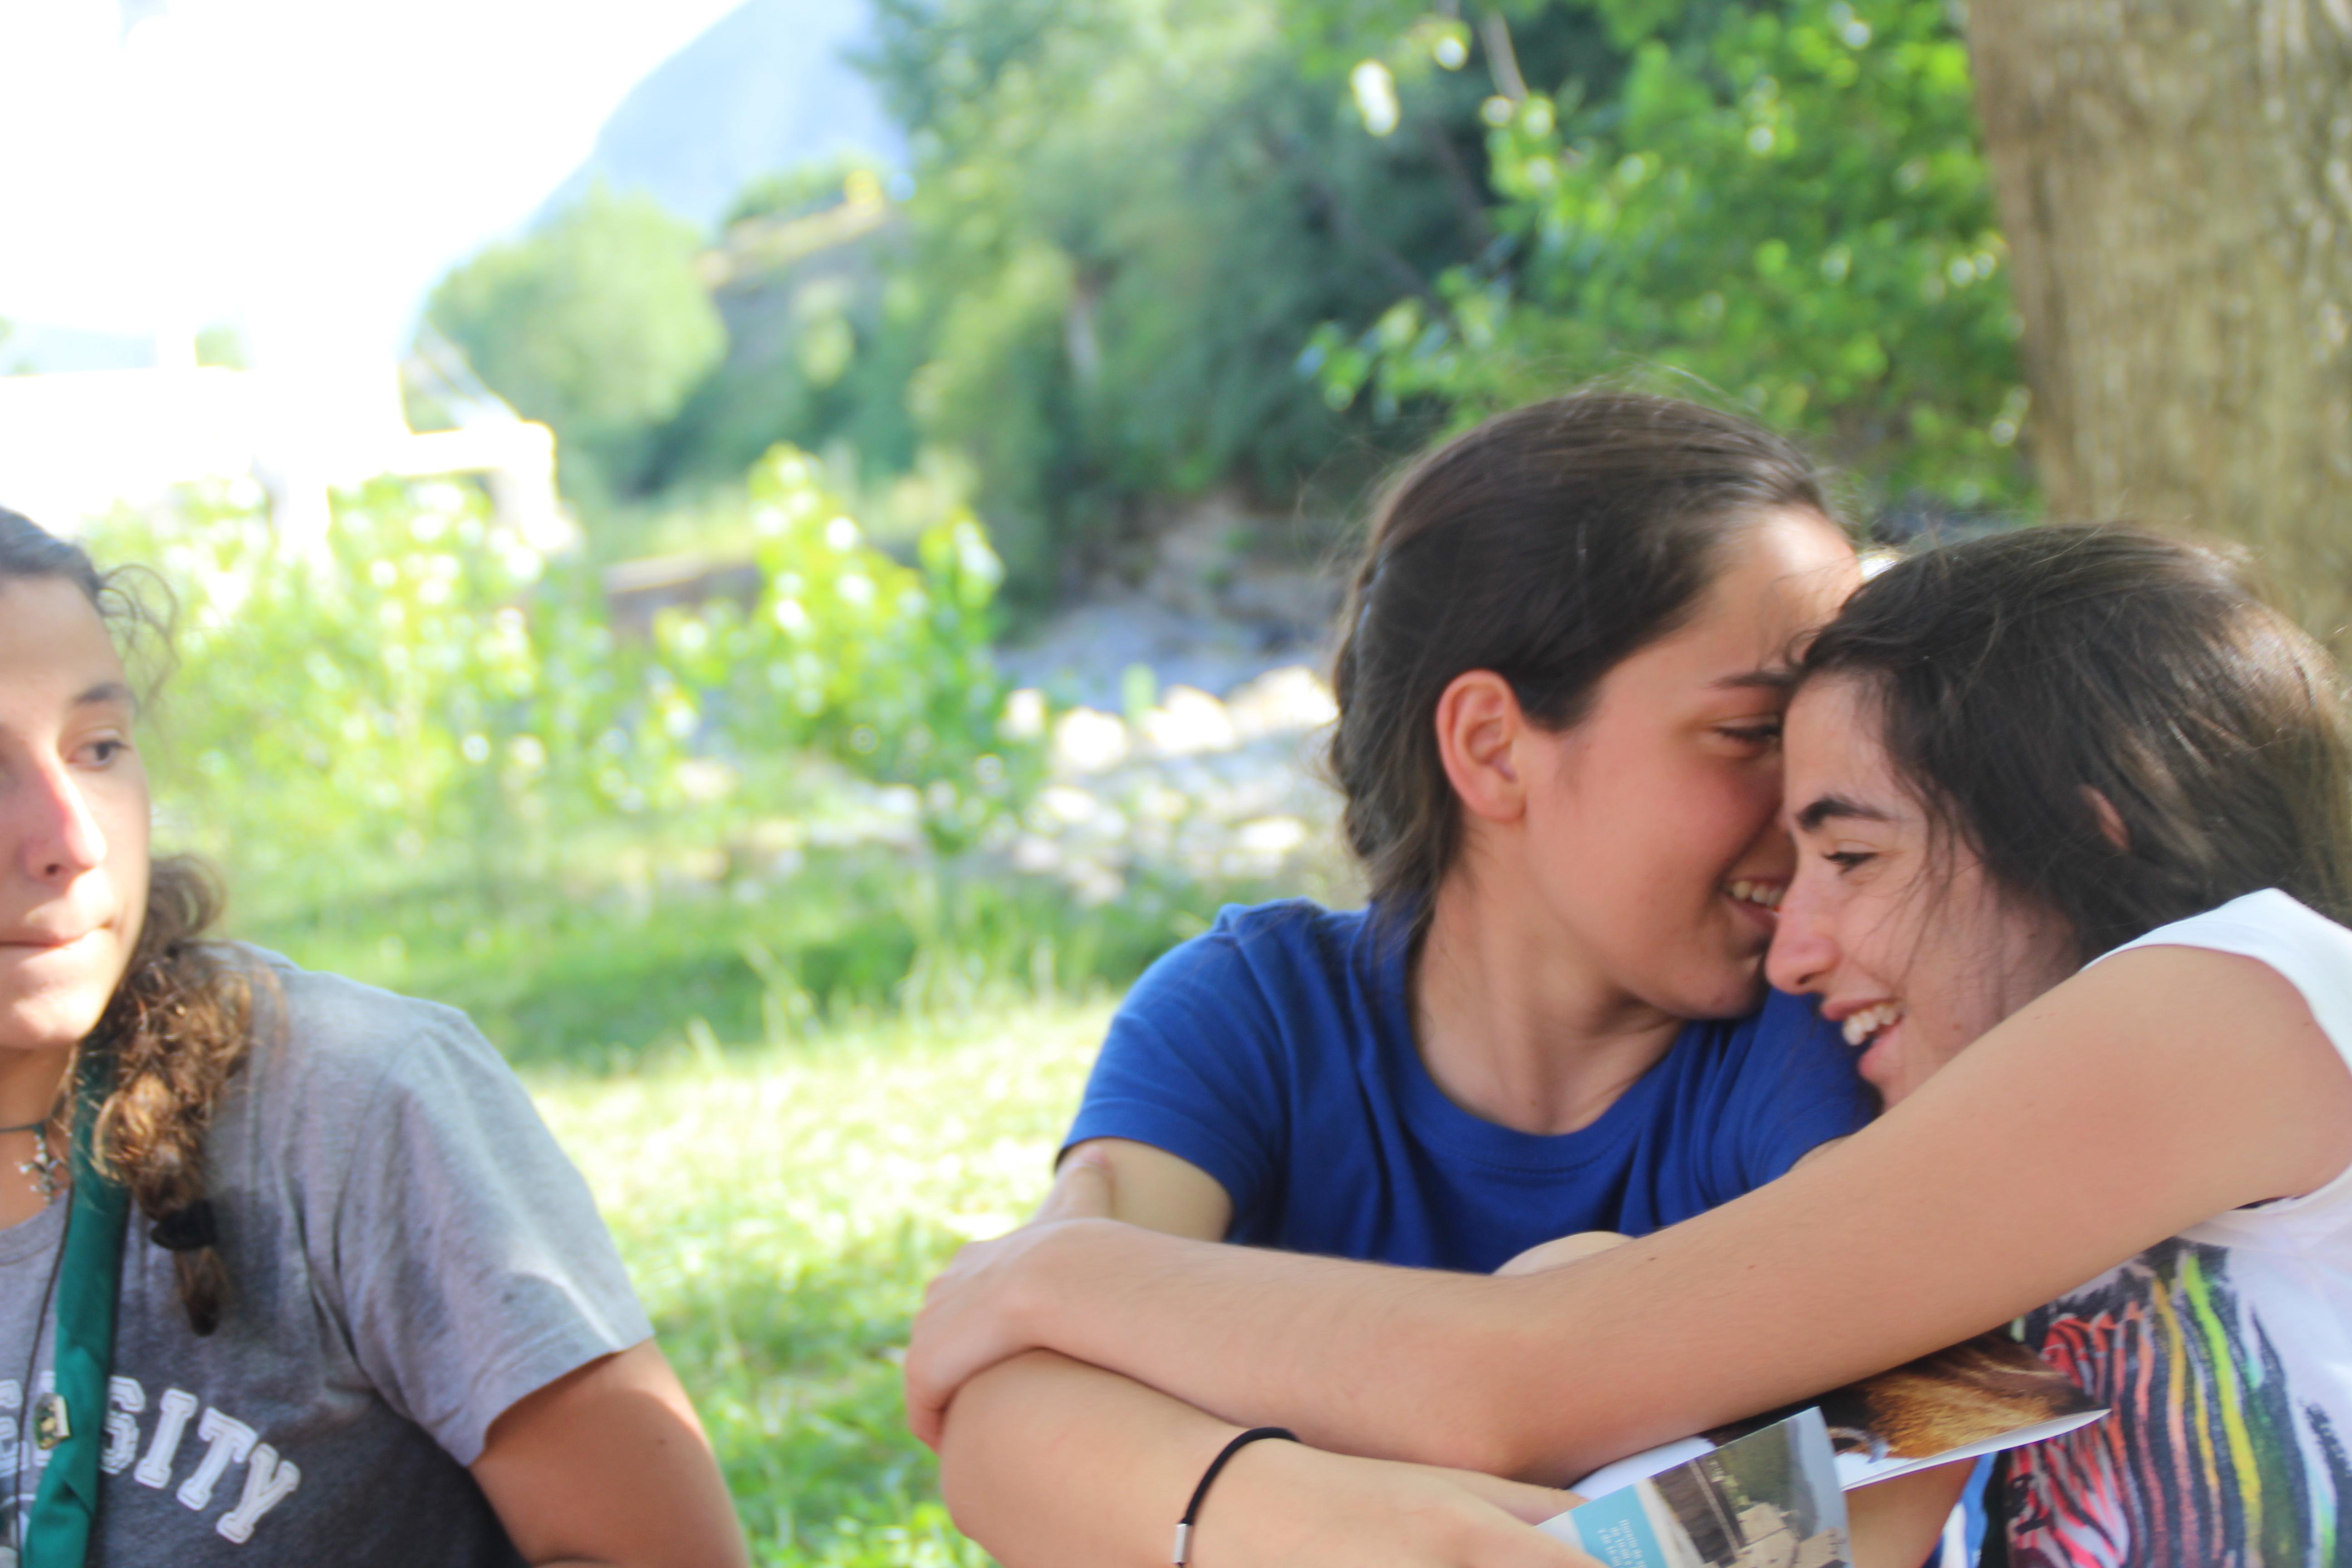 15-16 - Grupo - Campamento de verano - P132